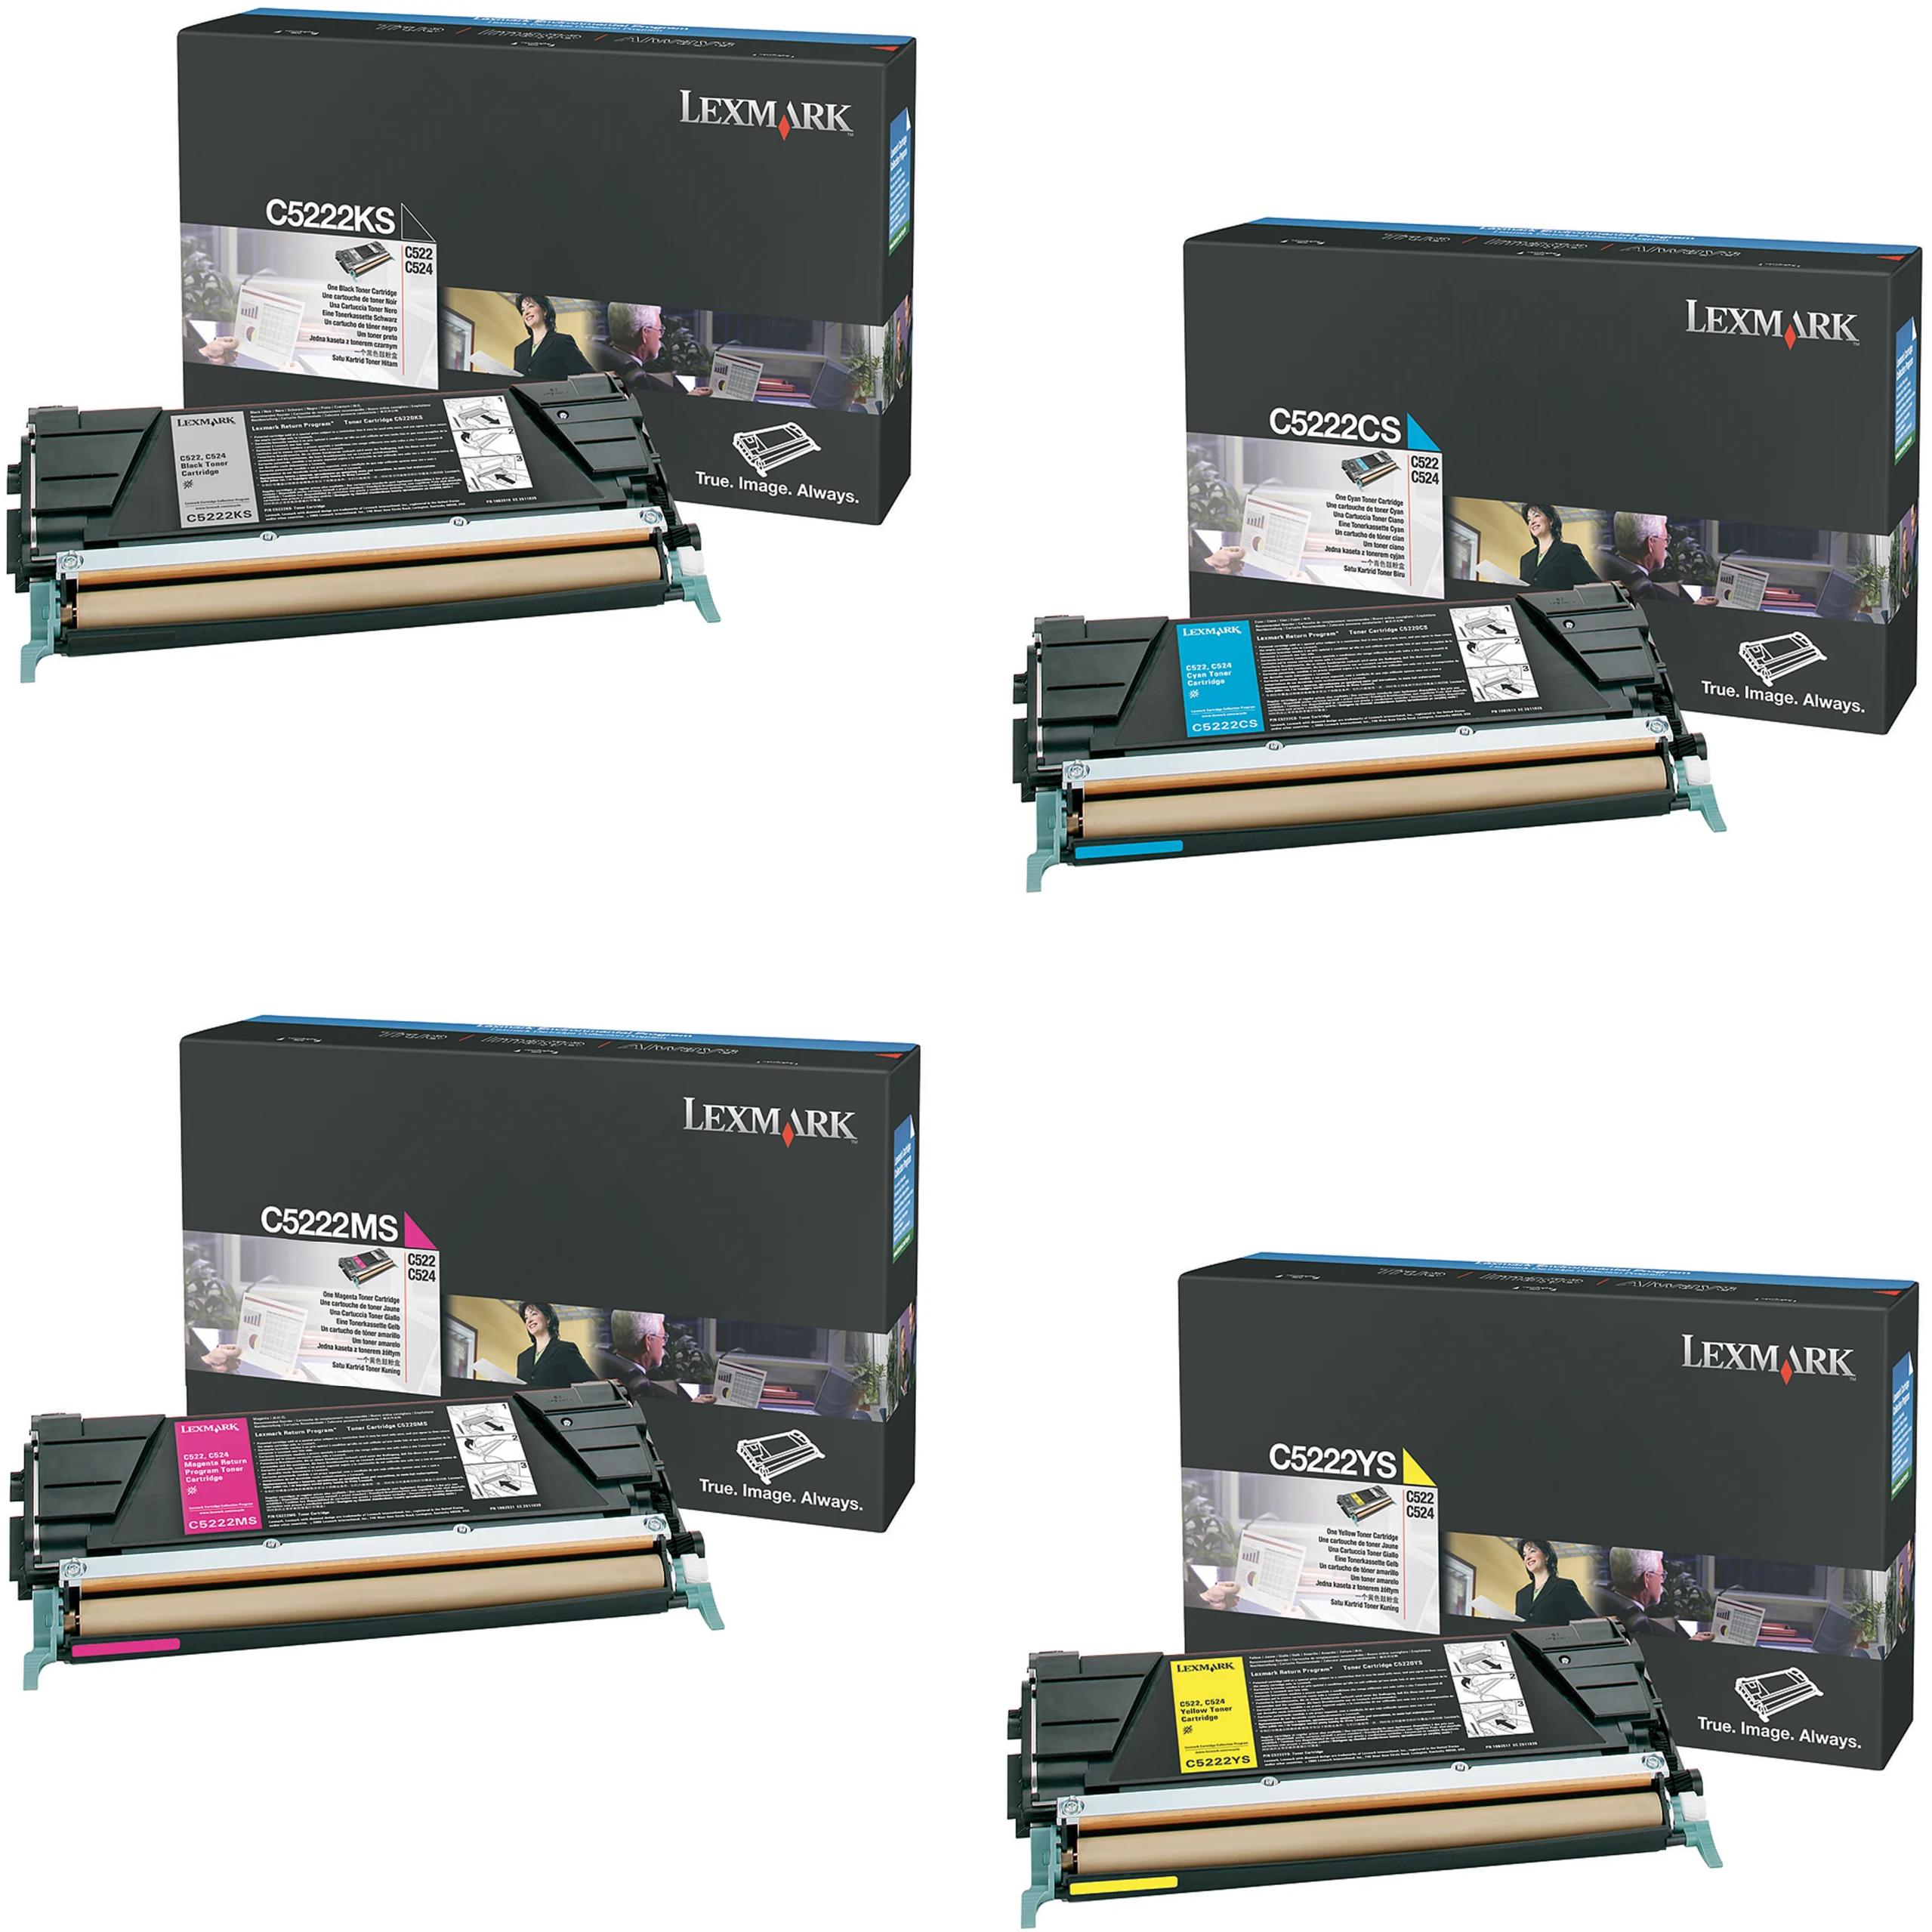 Lexmark C5222 Set | C5222CS C5222KS C5222MS C5222YS | Original Lexmark Toner Cartridges – Black, Cyan, Magenta, Yellow